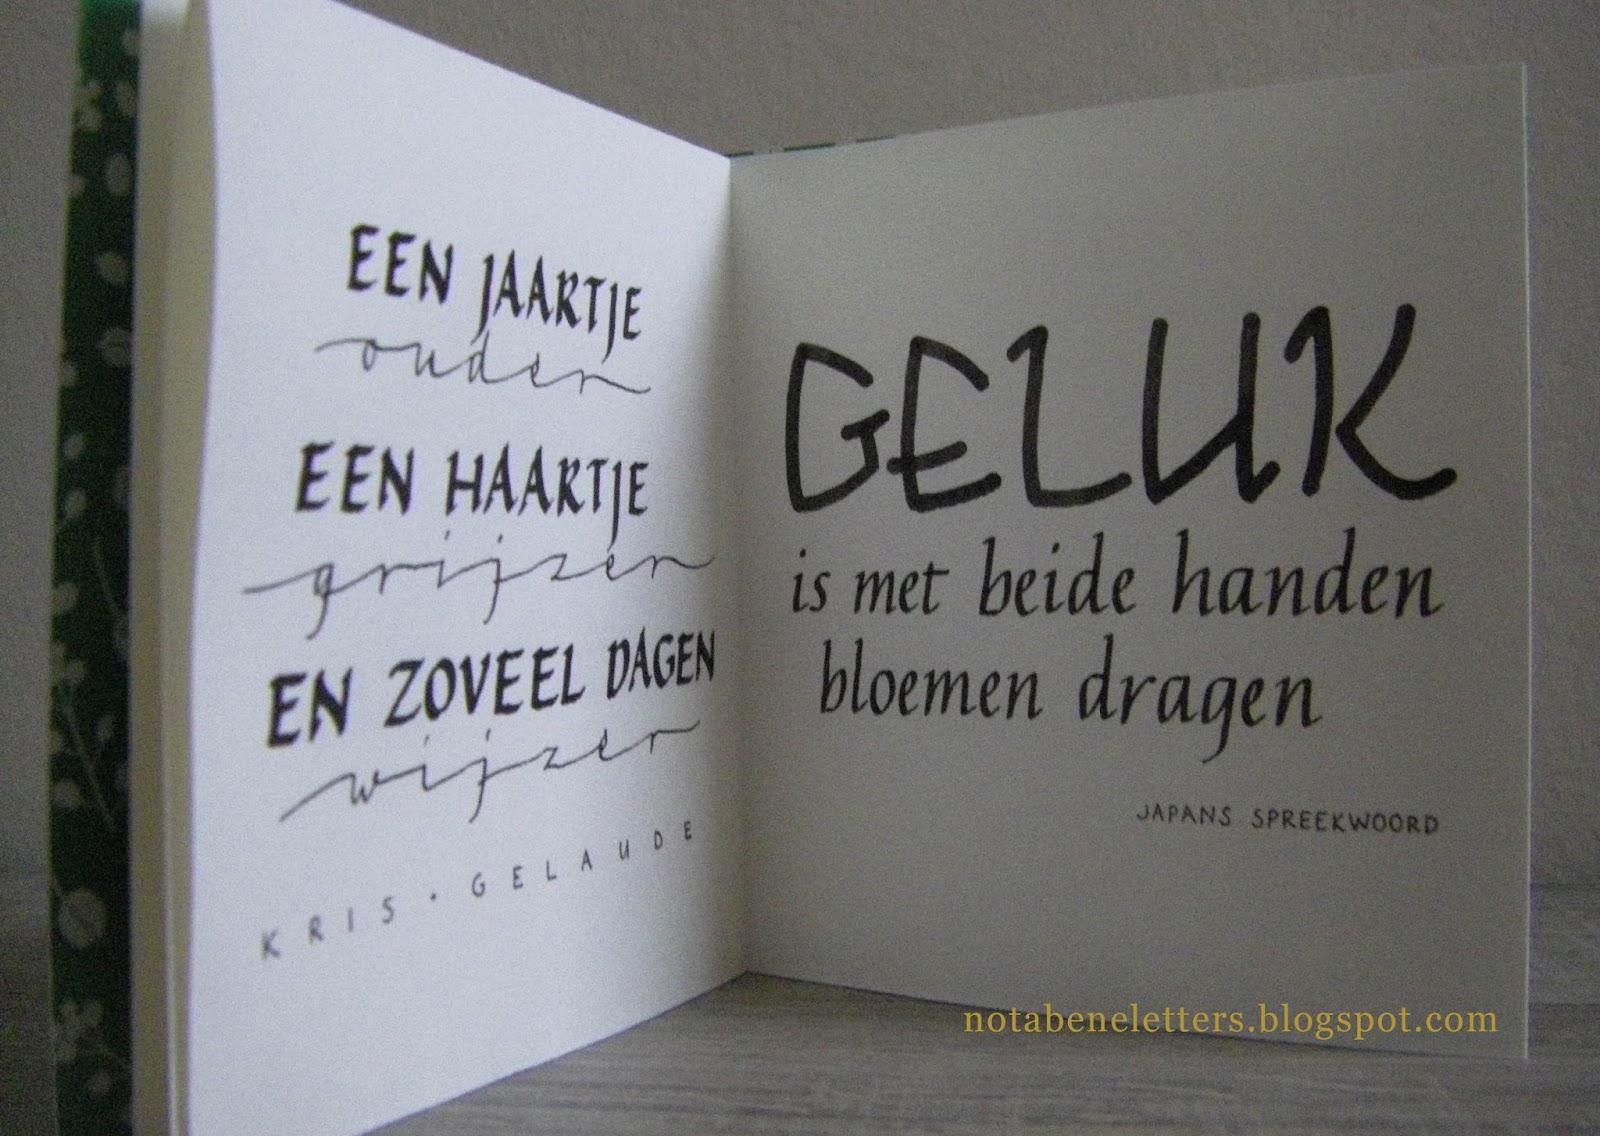 Citaten Cursief : Nota bene citatenboekje booklet with quotes